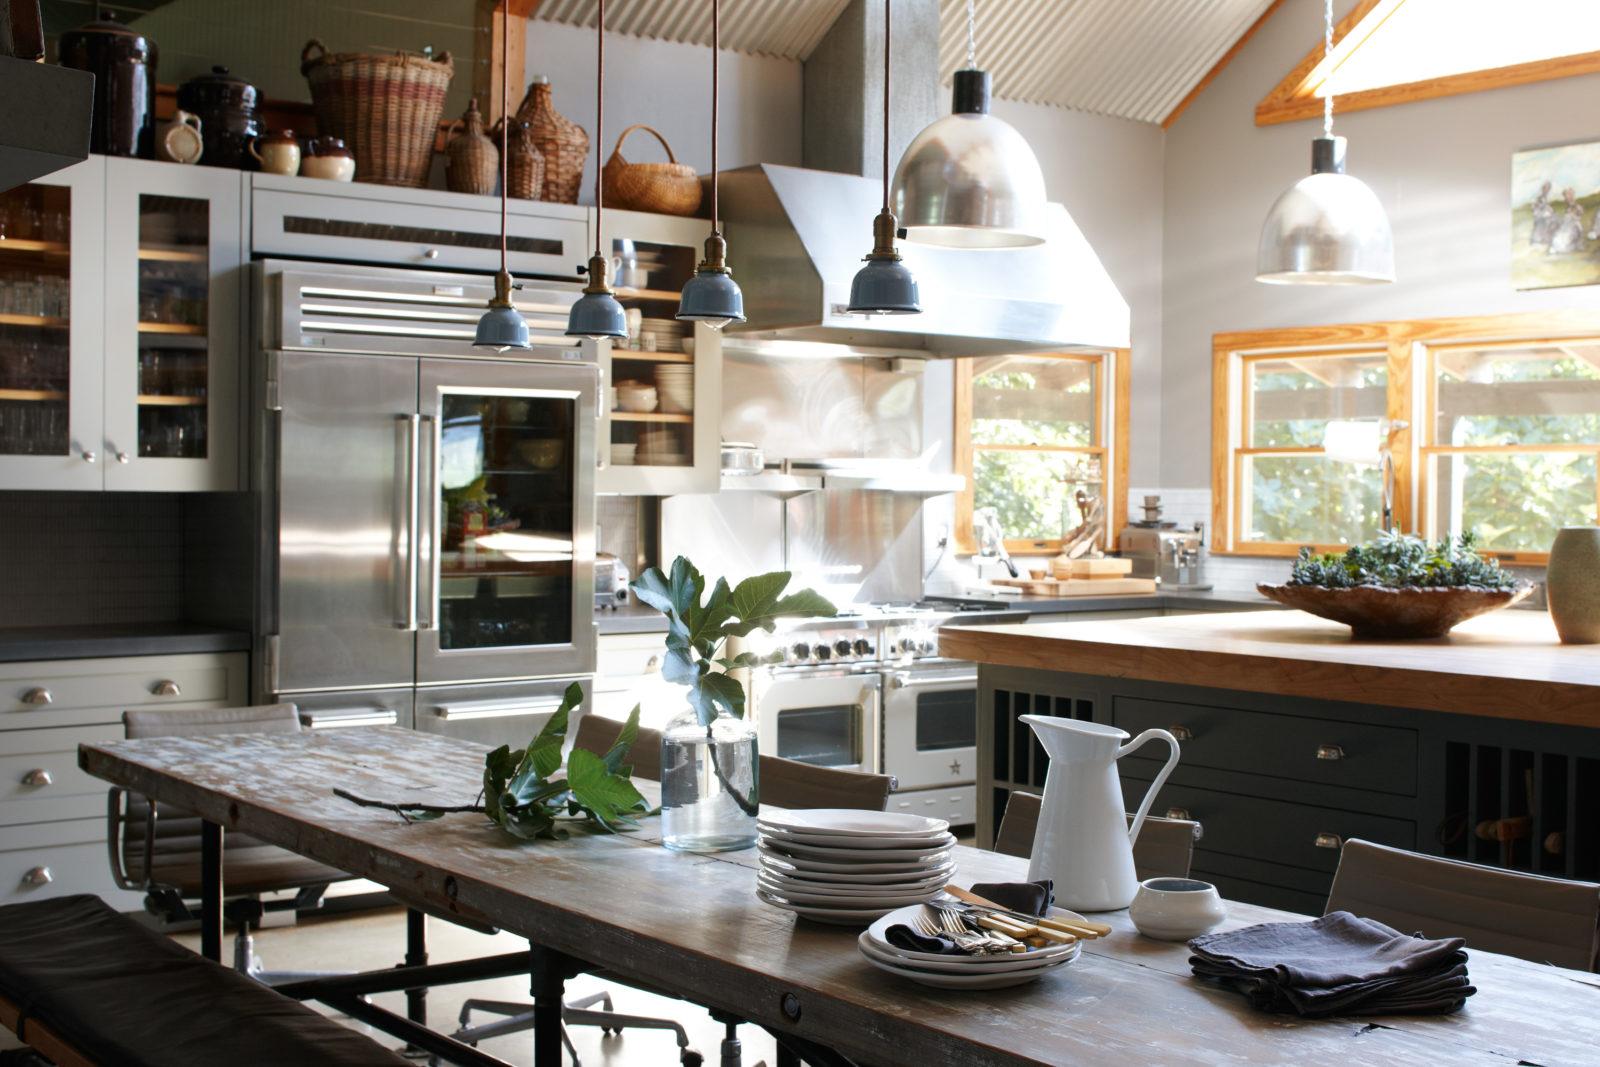 Southern Kitchen Design southern kitchens showroom 2350 duke street suite a alexandria va 22314 703 548 4459 12 Great Southern Kitchens Garden Gun